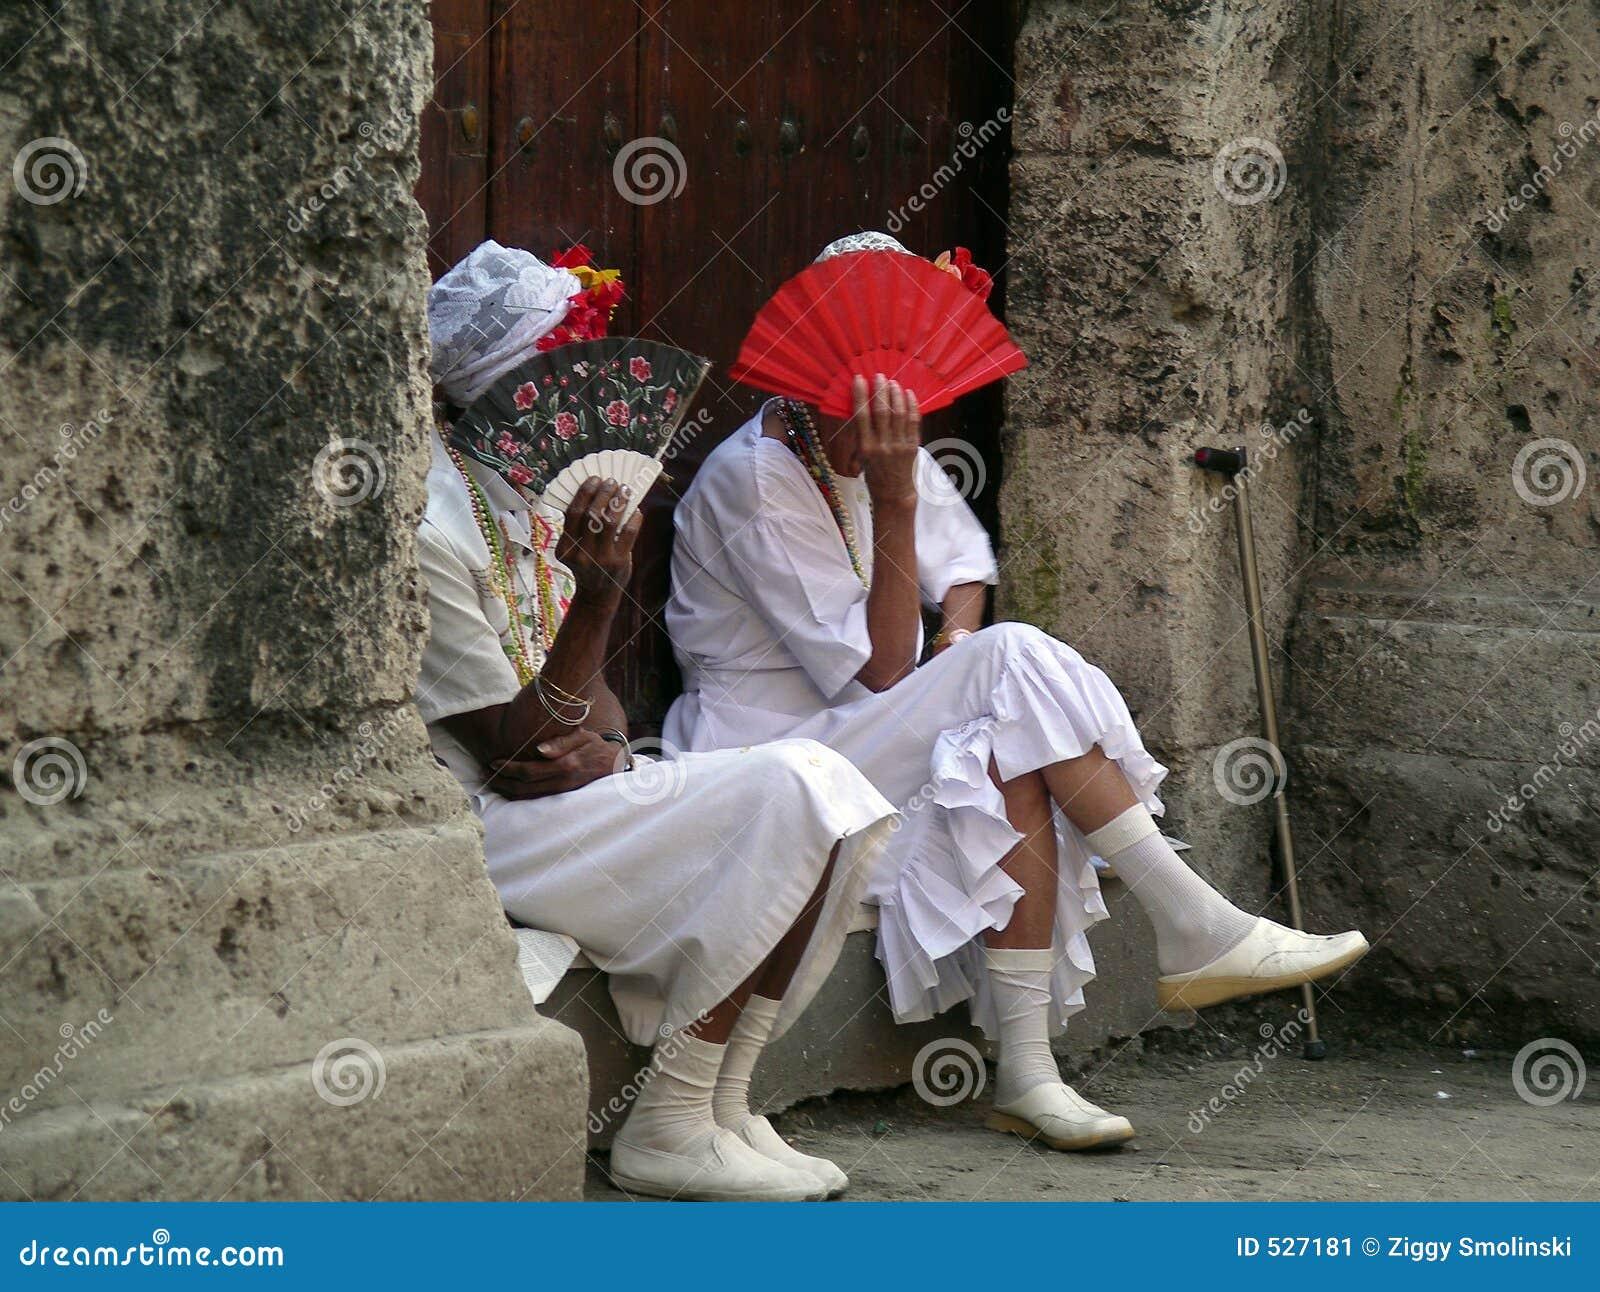 Download 2个古巴夫人 库存图片. 图片 包括有 覆盖物, 放松, 开会, 风扇, 古巴, 通知, 夫人, 表面, 服装 - 527181